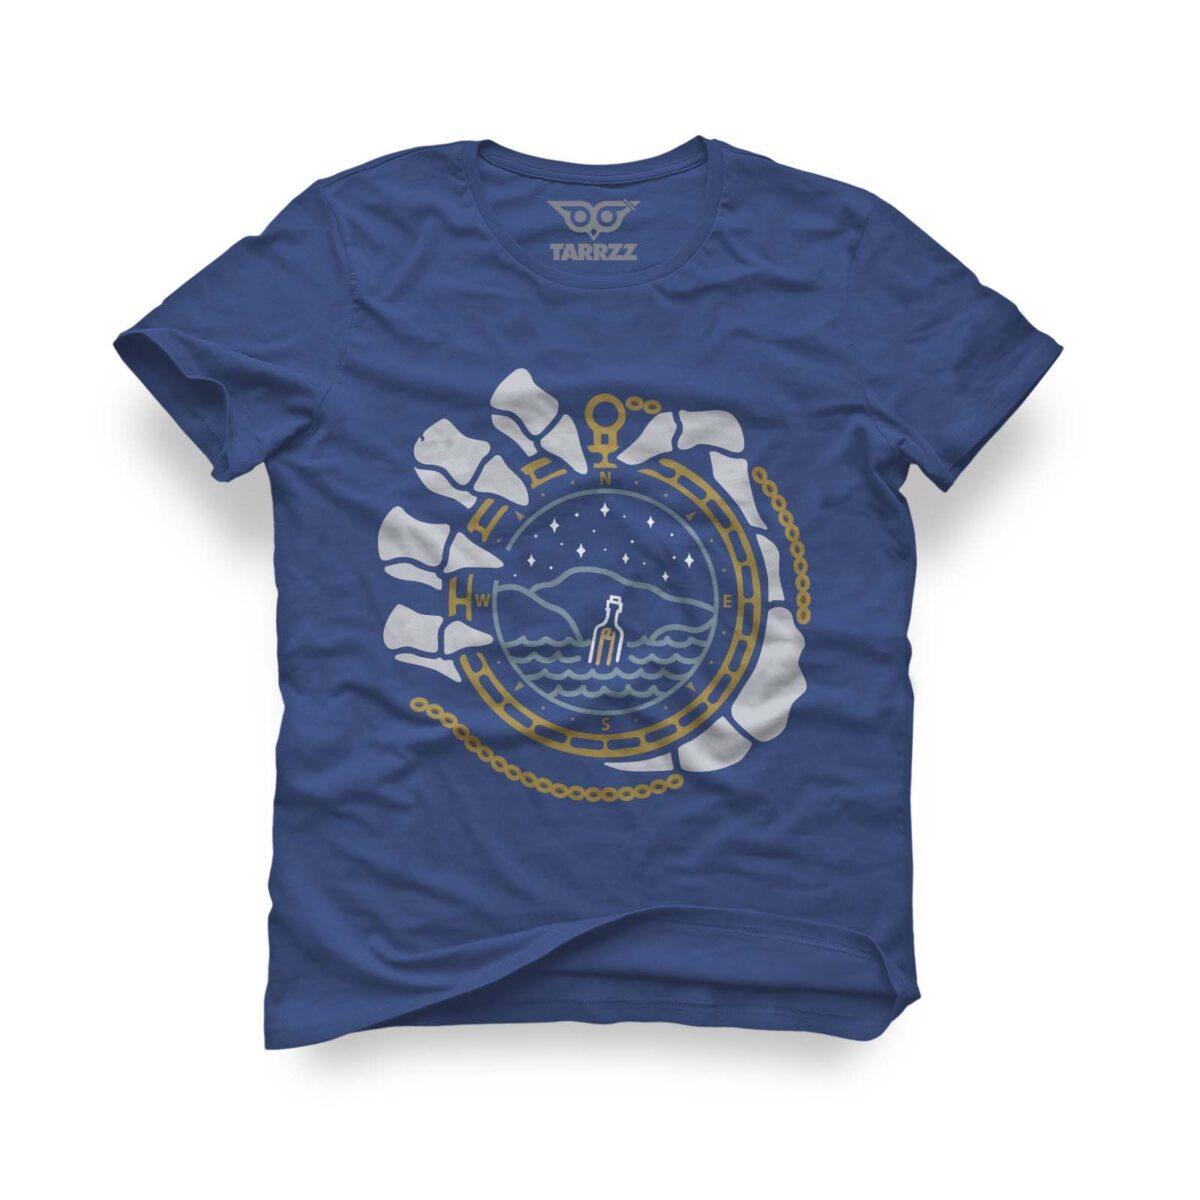 tarrzz-tasarim-marine-mavi-tisort-iskelet-ve-pusula